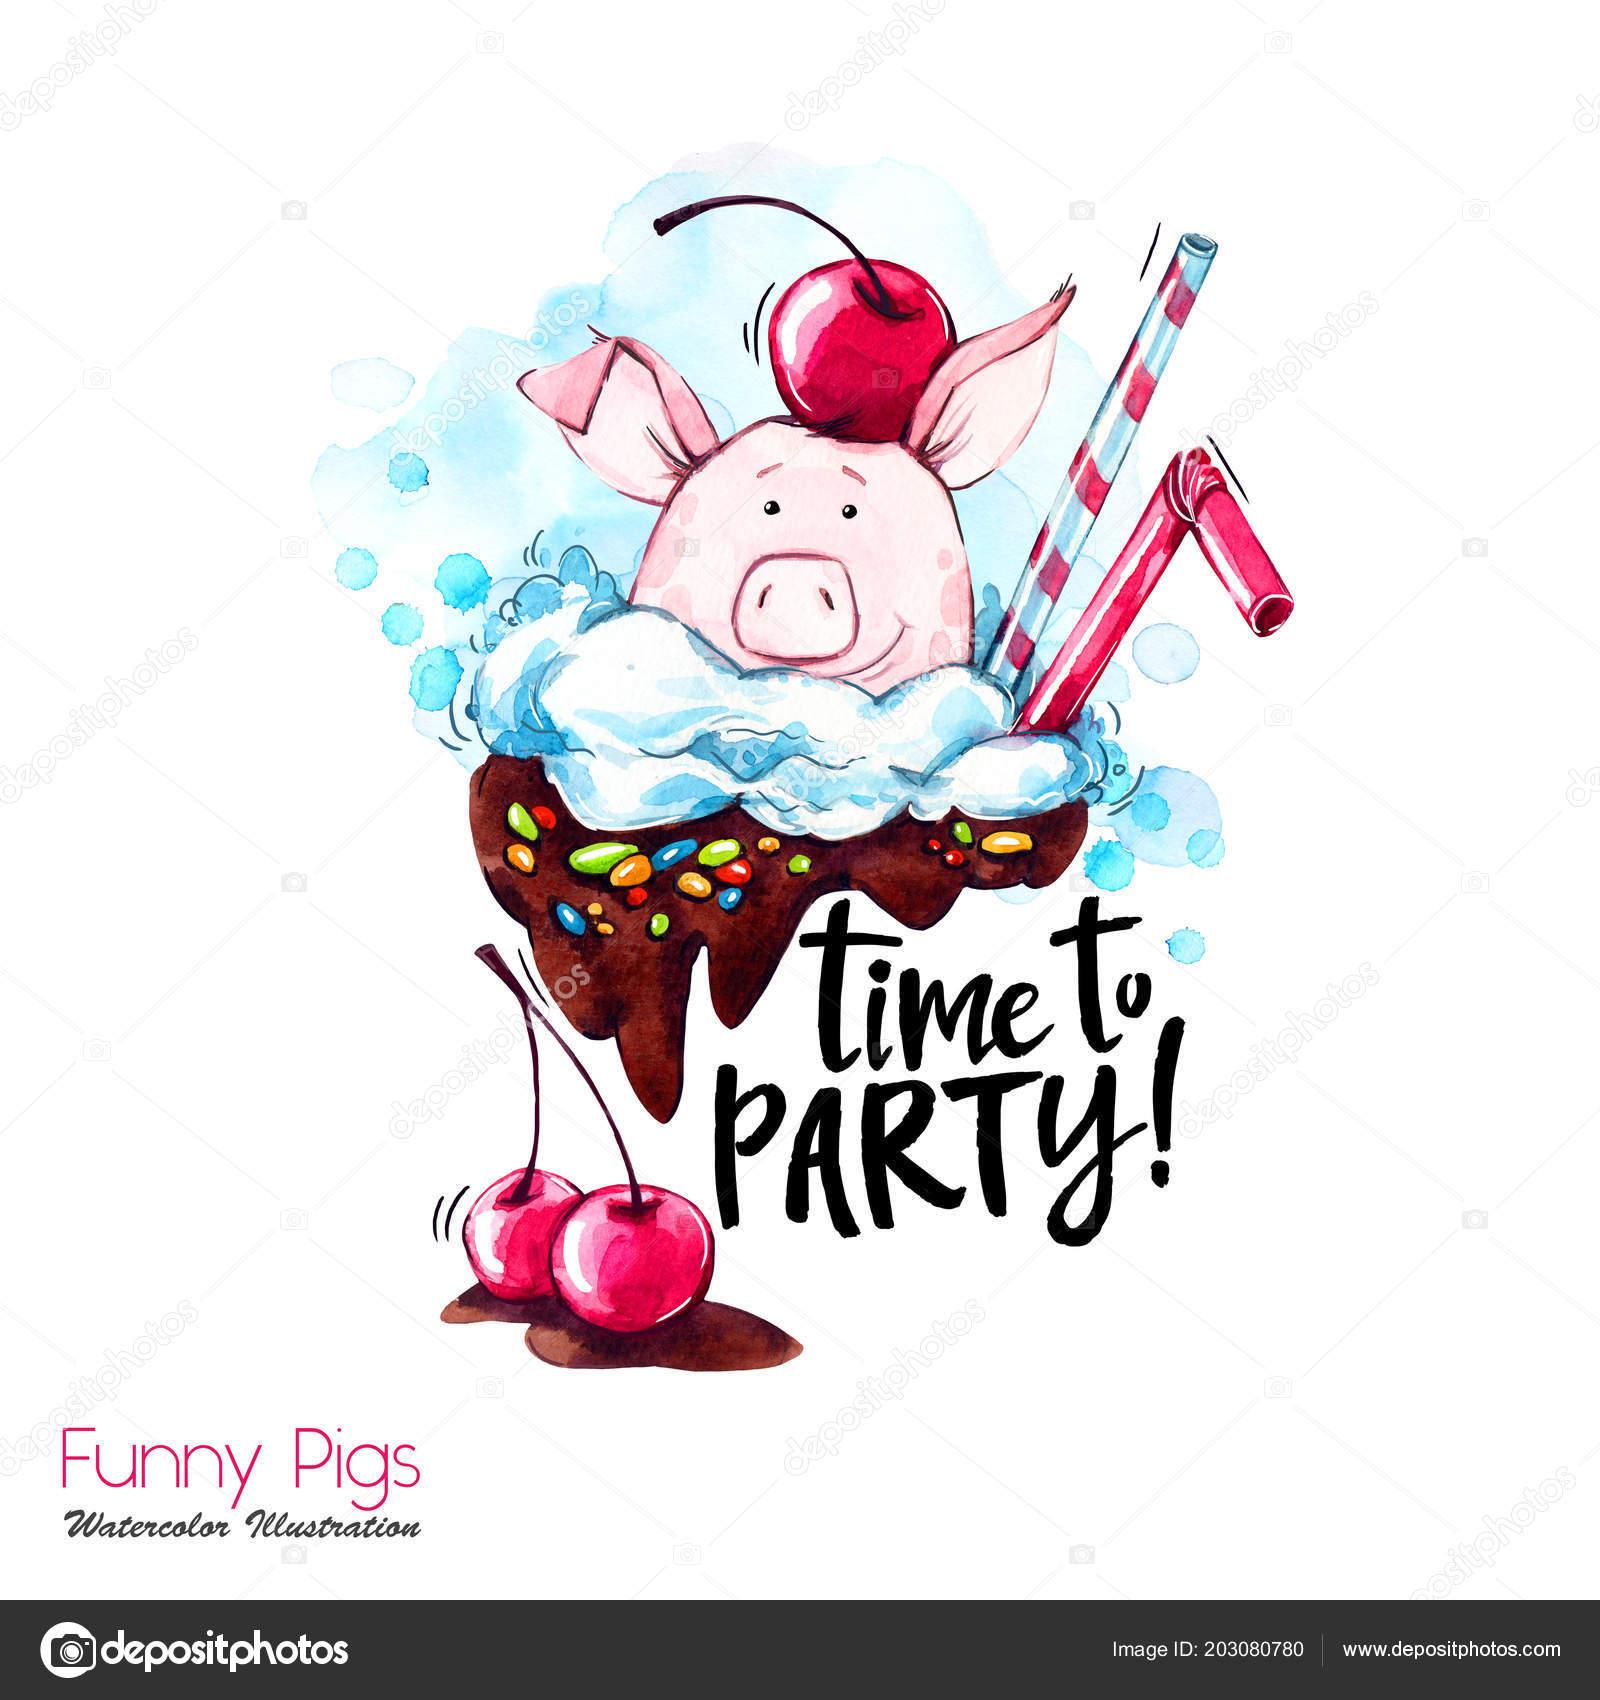 Gruß Urlaub Abbildung Aquarell Cartoon Schwein Mit Party Schriftzug